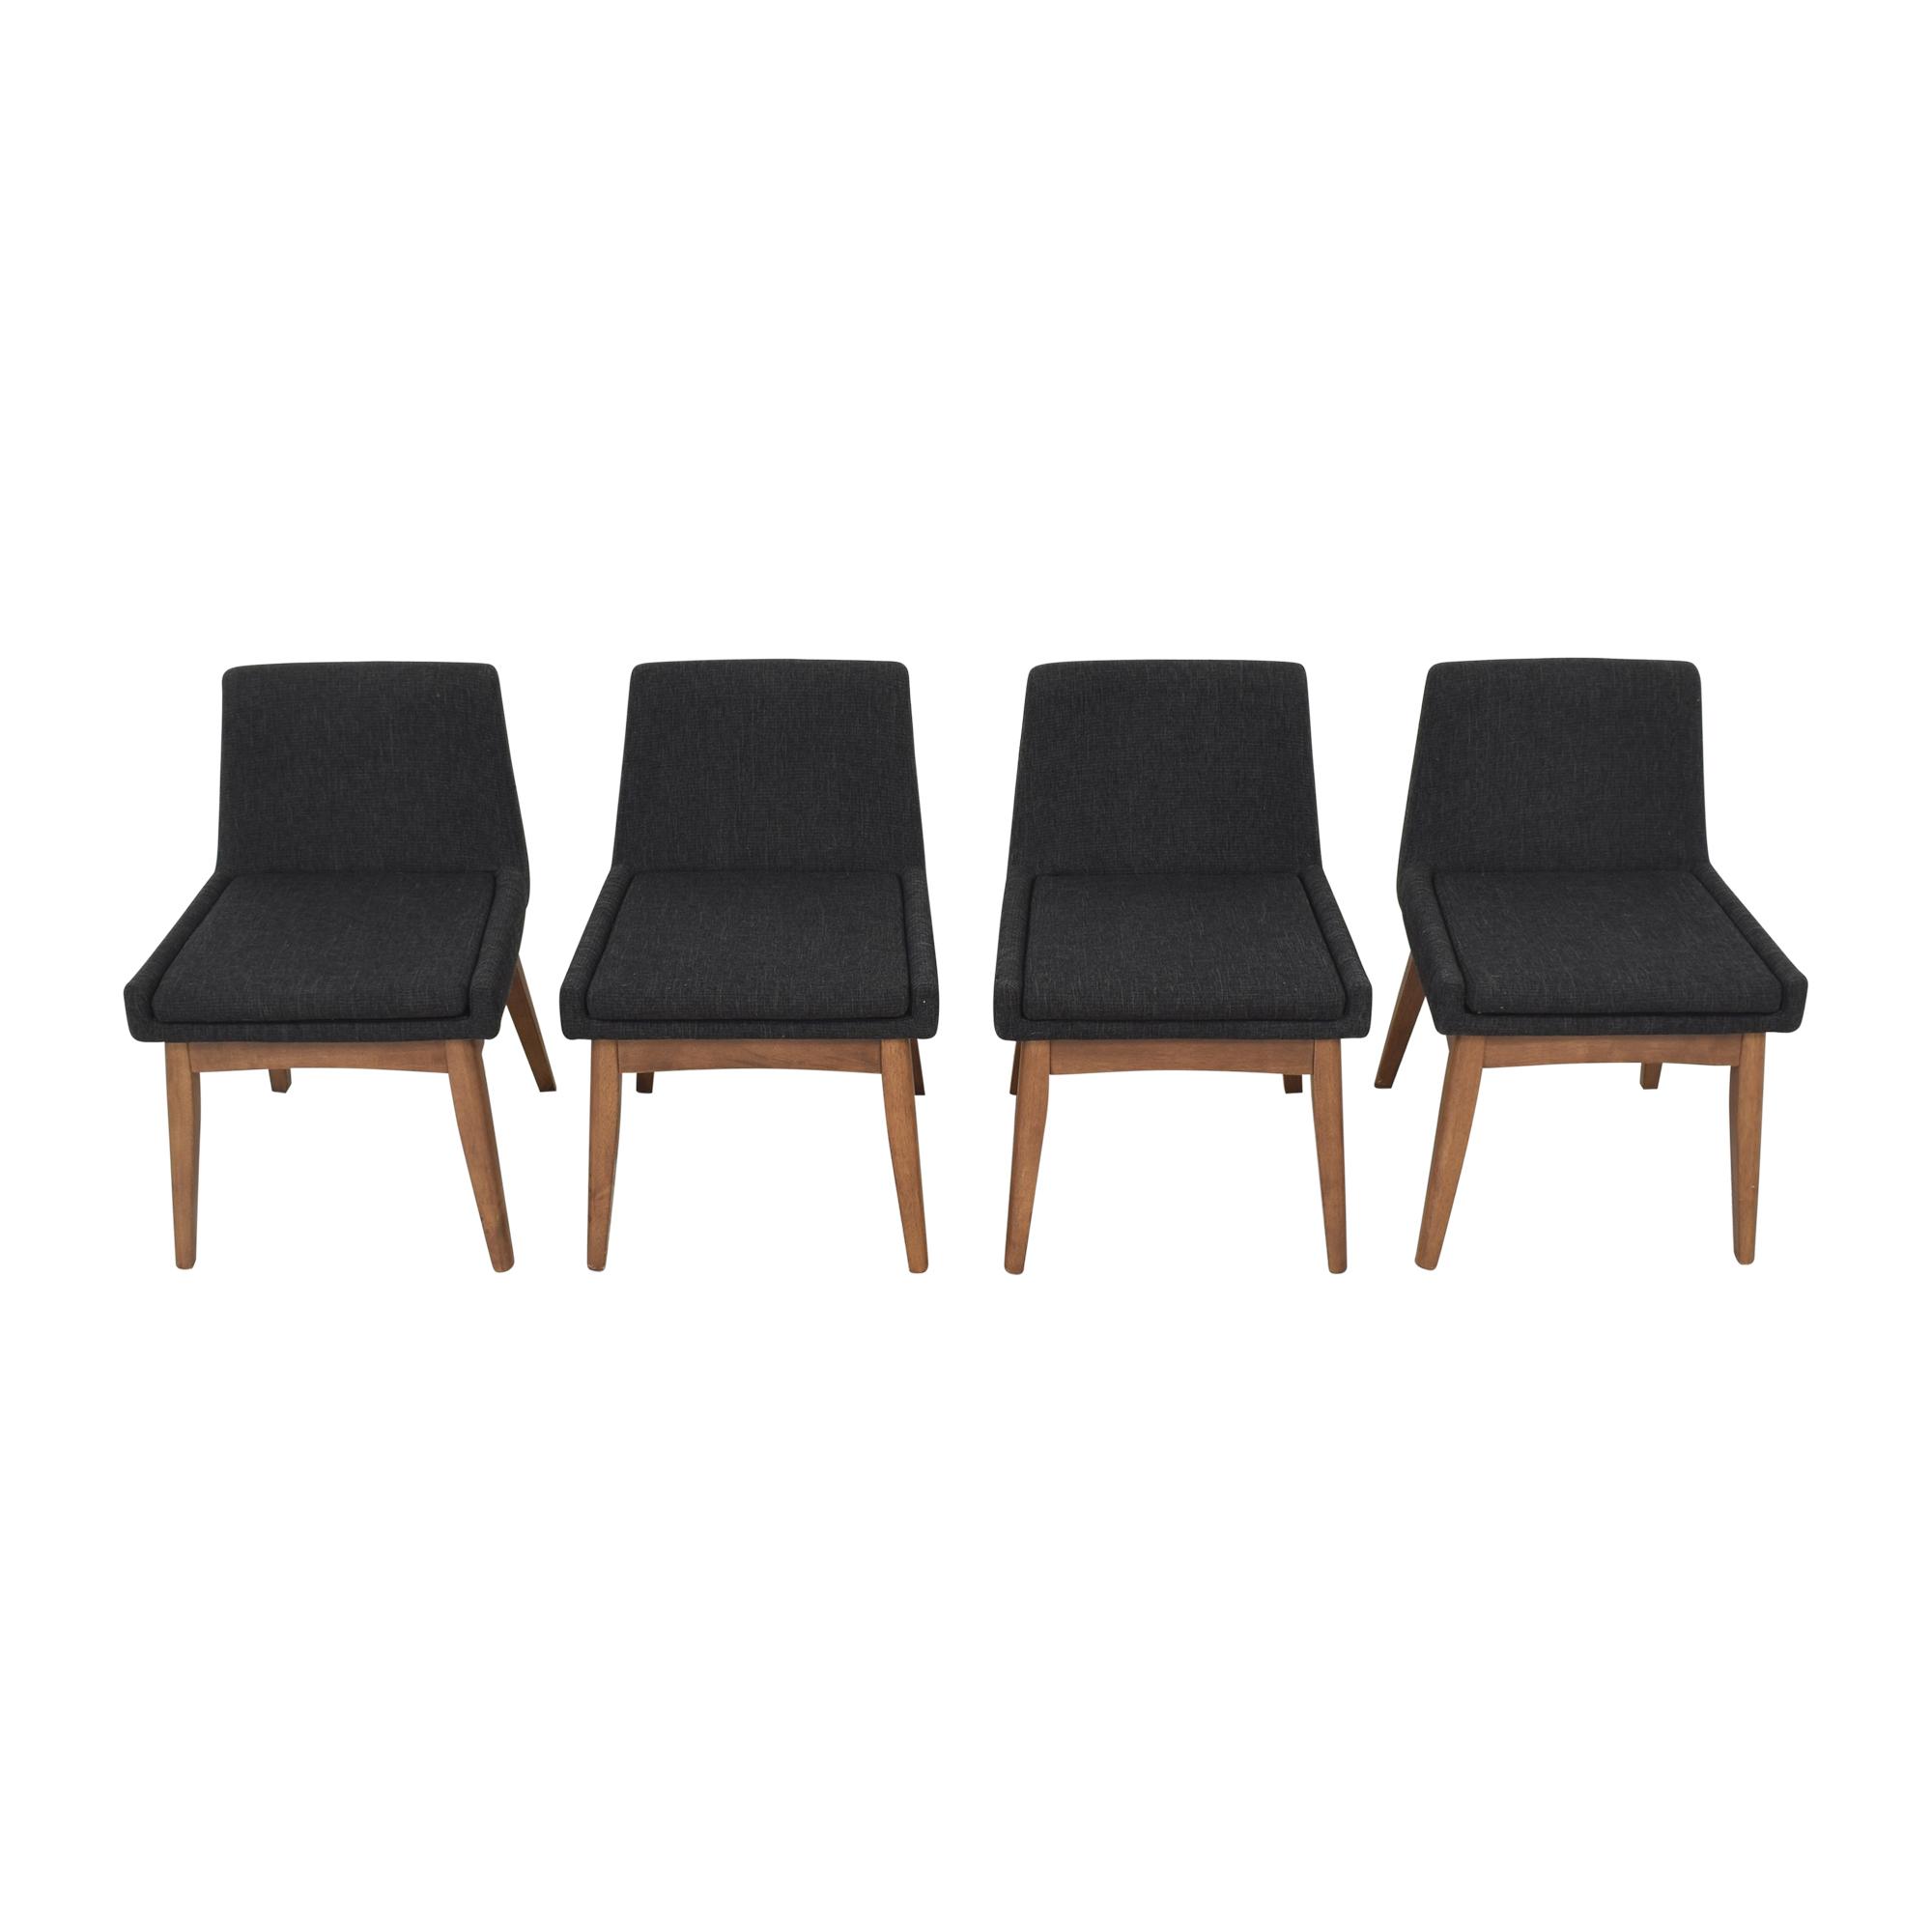 shop AllModern AllModern Hayes Upholstered Dining Chairs online